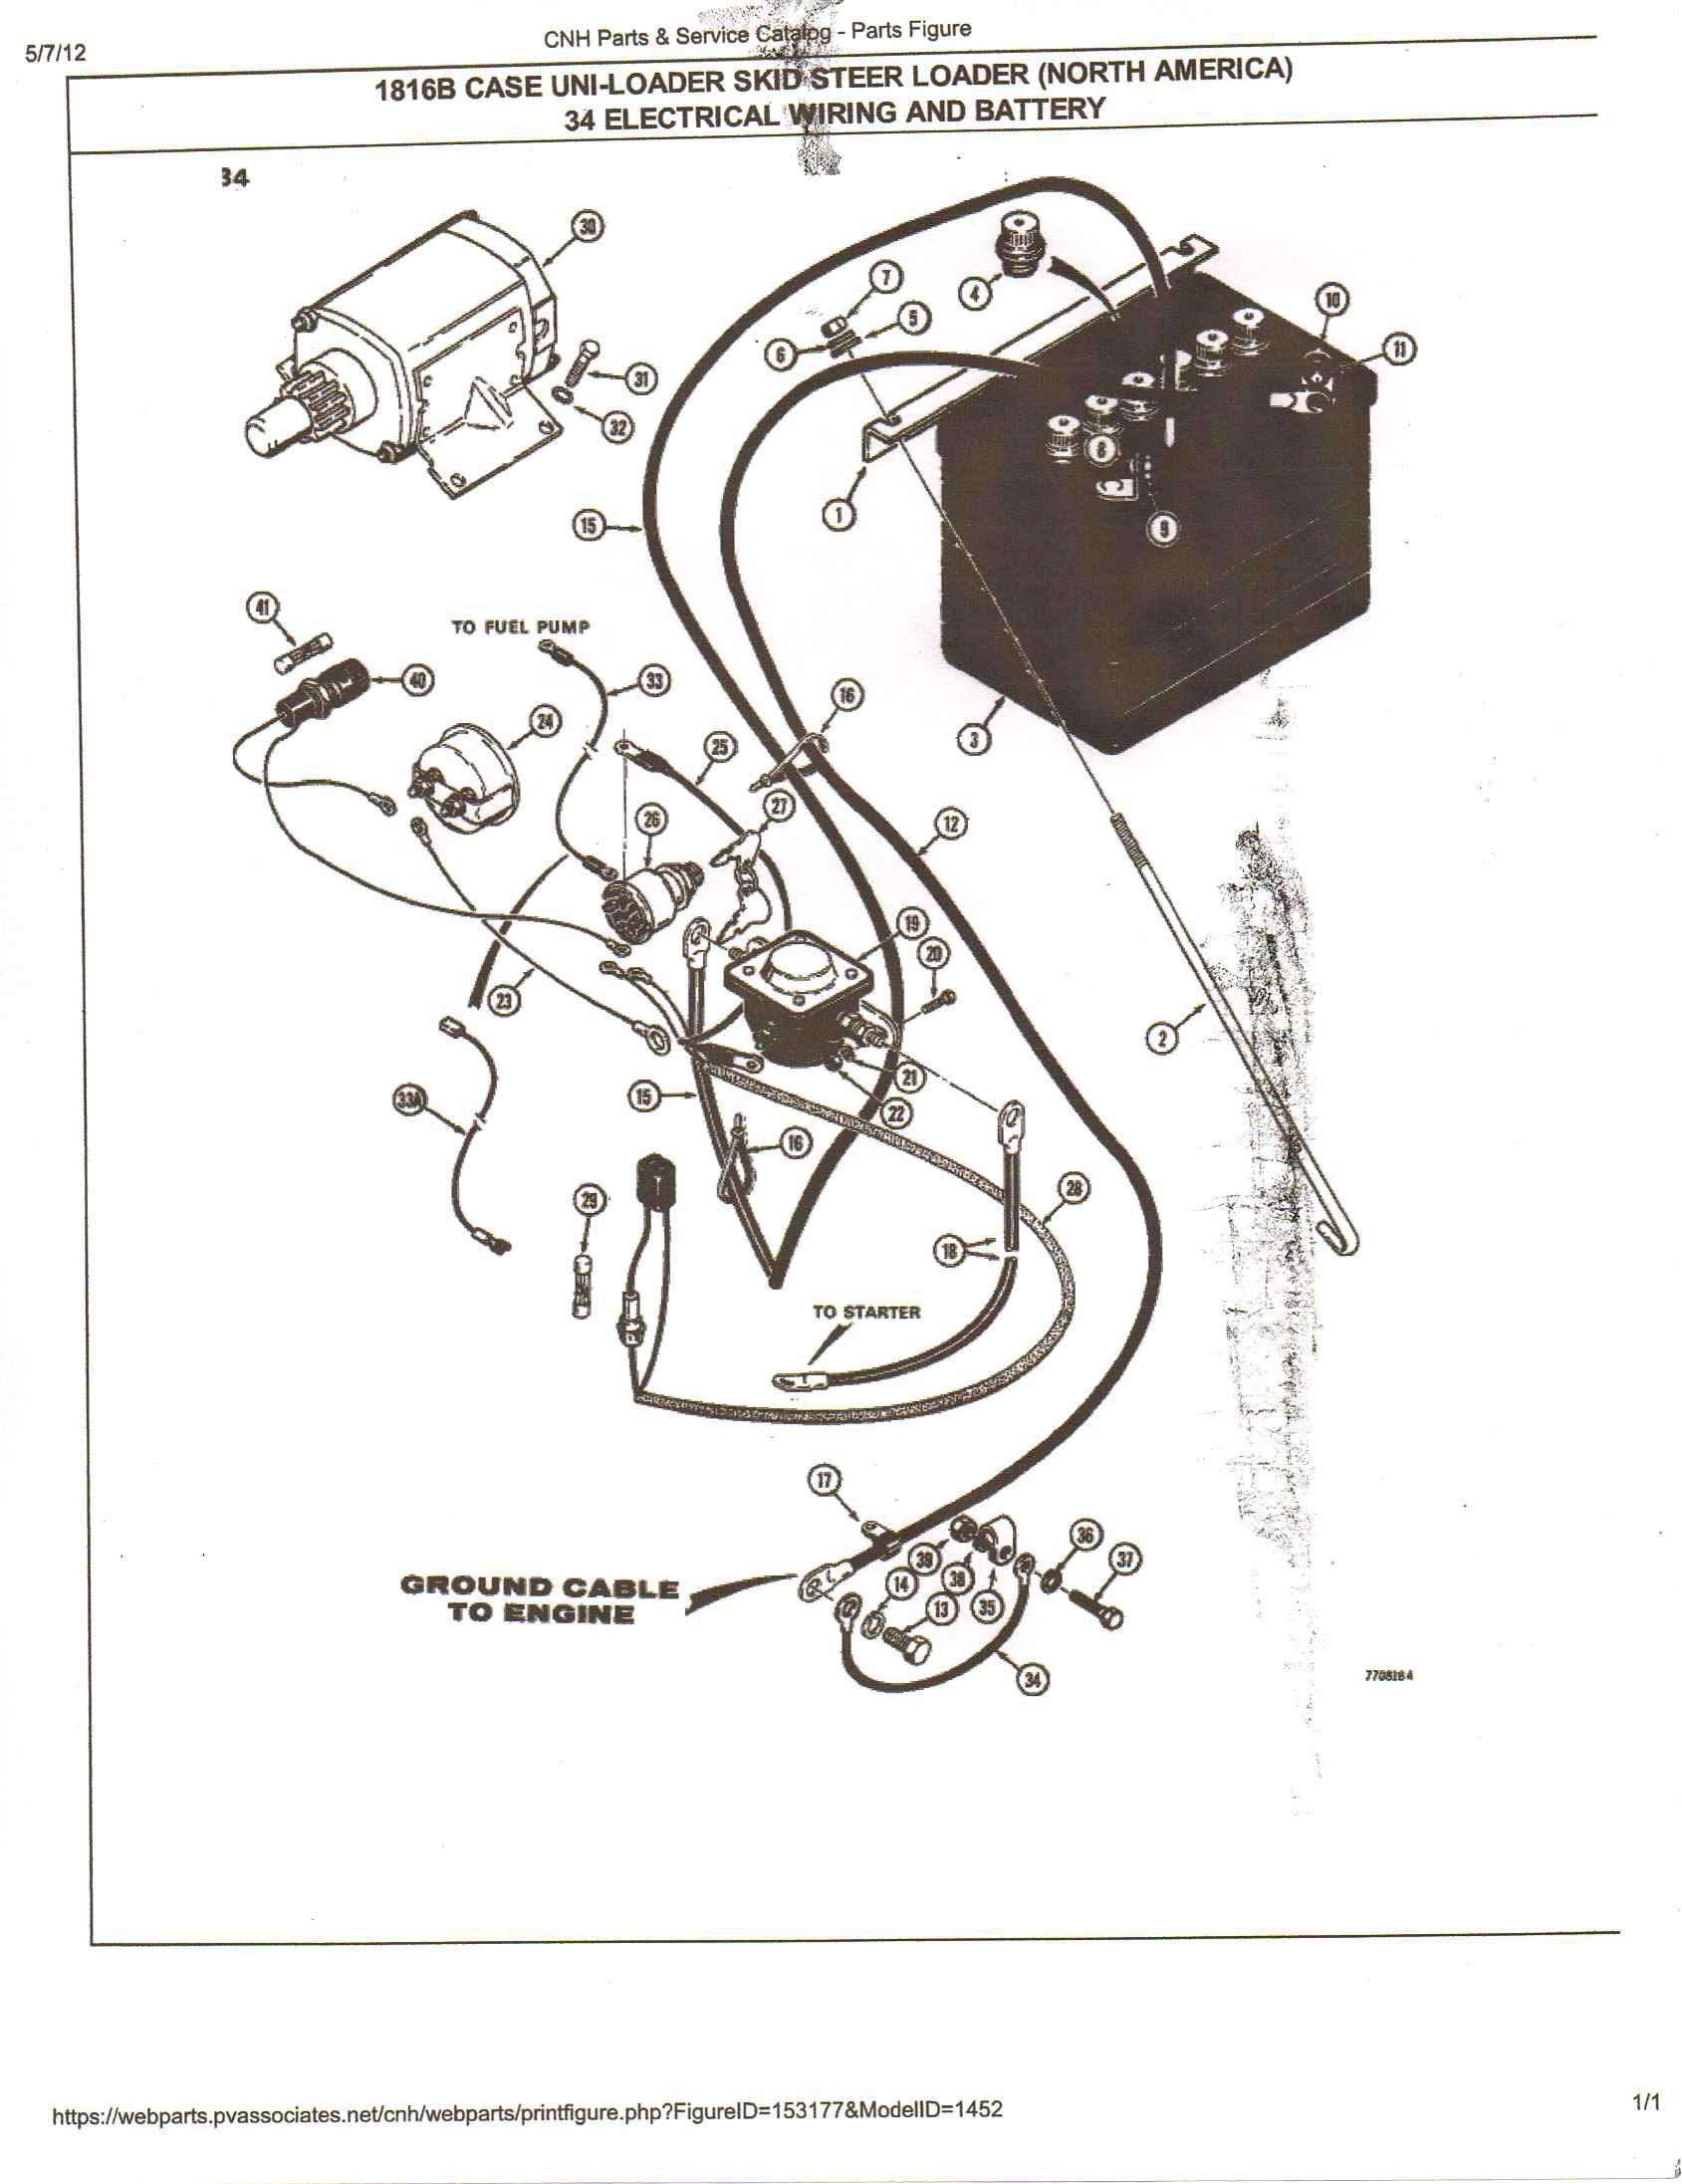 Case Excavator Wiring Diagrams 1988 Chevy Astro Van Alternator Wiring Diagram Begeboy Wiring Diagram Source